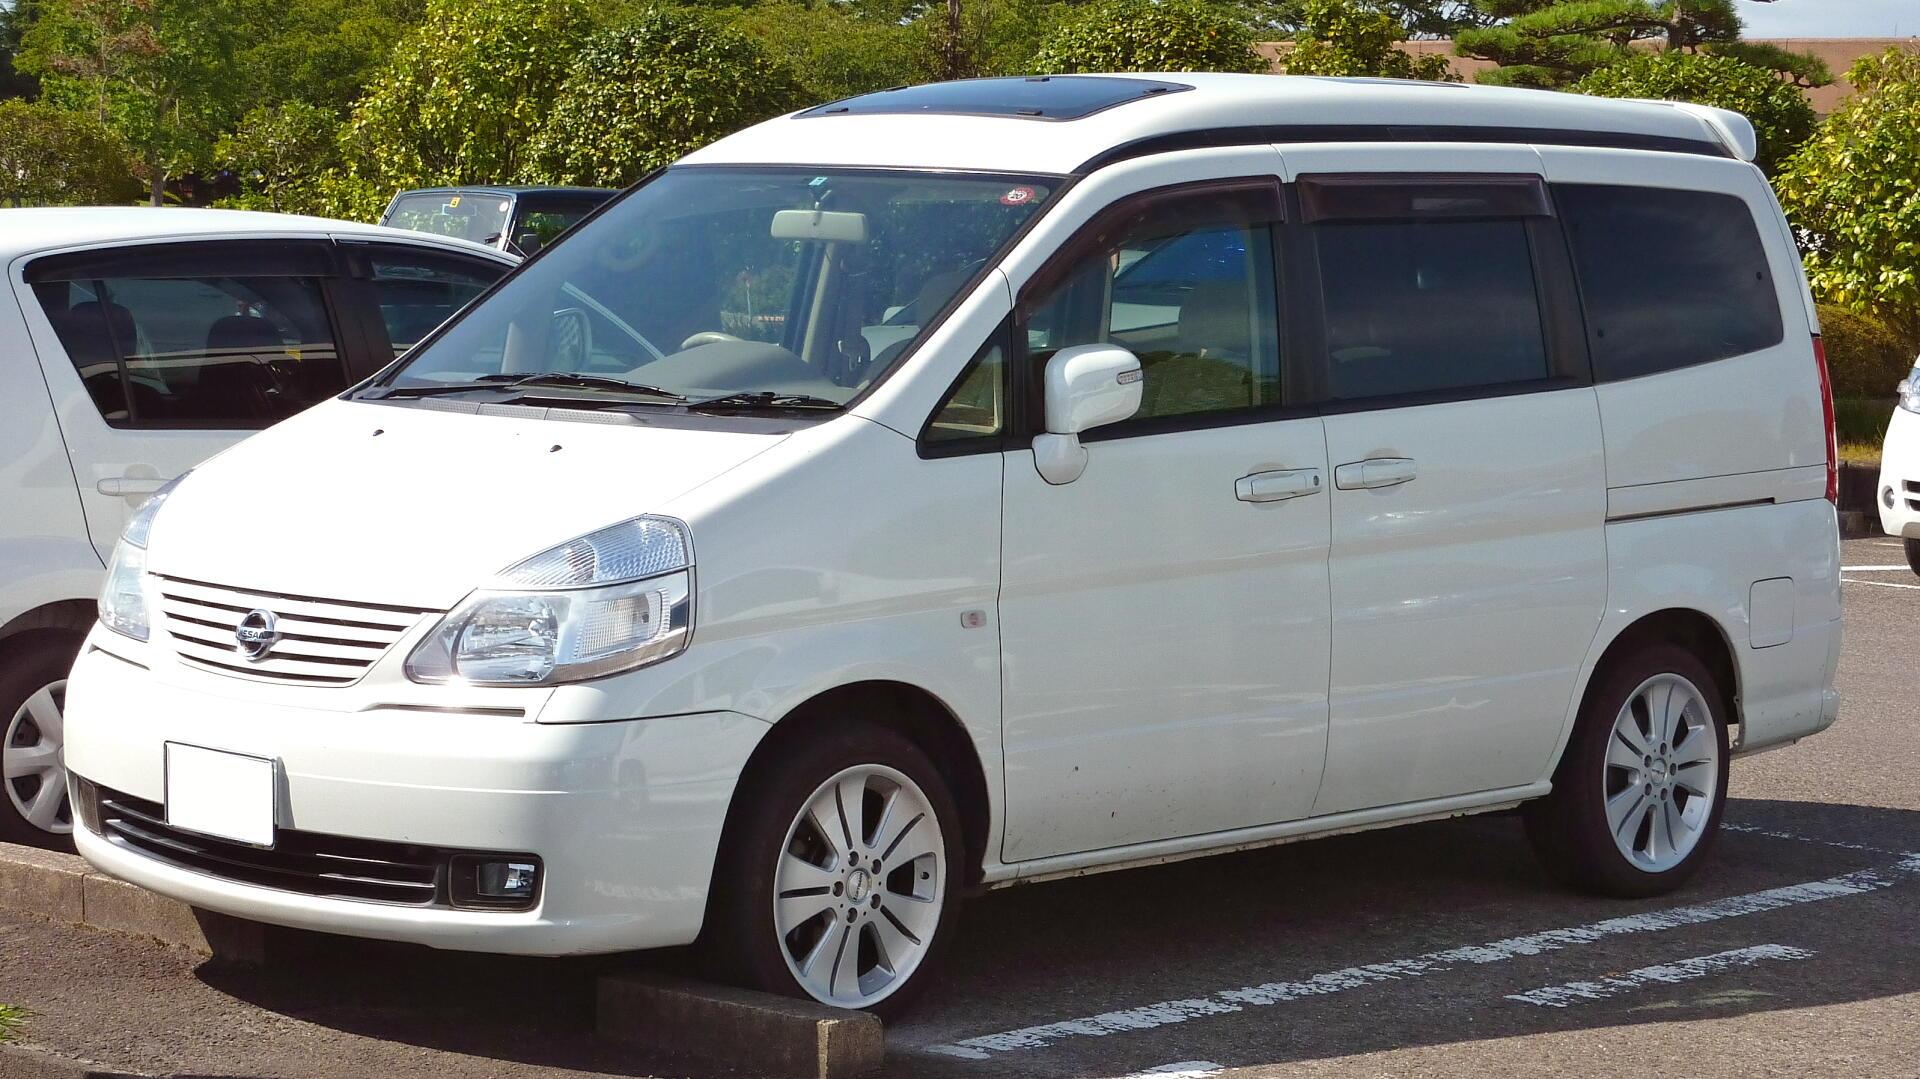 File C24 Nissan Serena 1 Jpg Wikimedia Commons